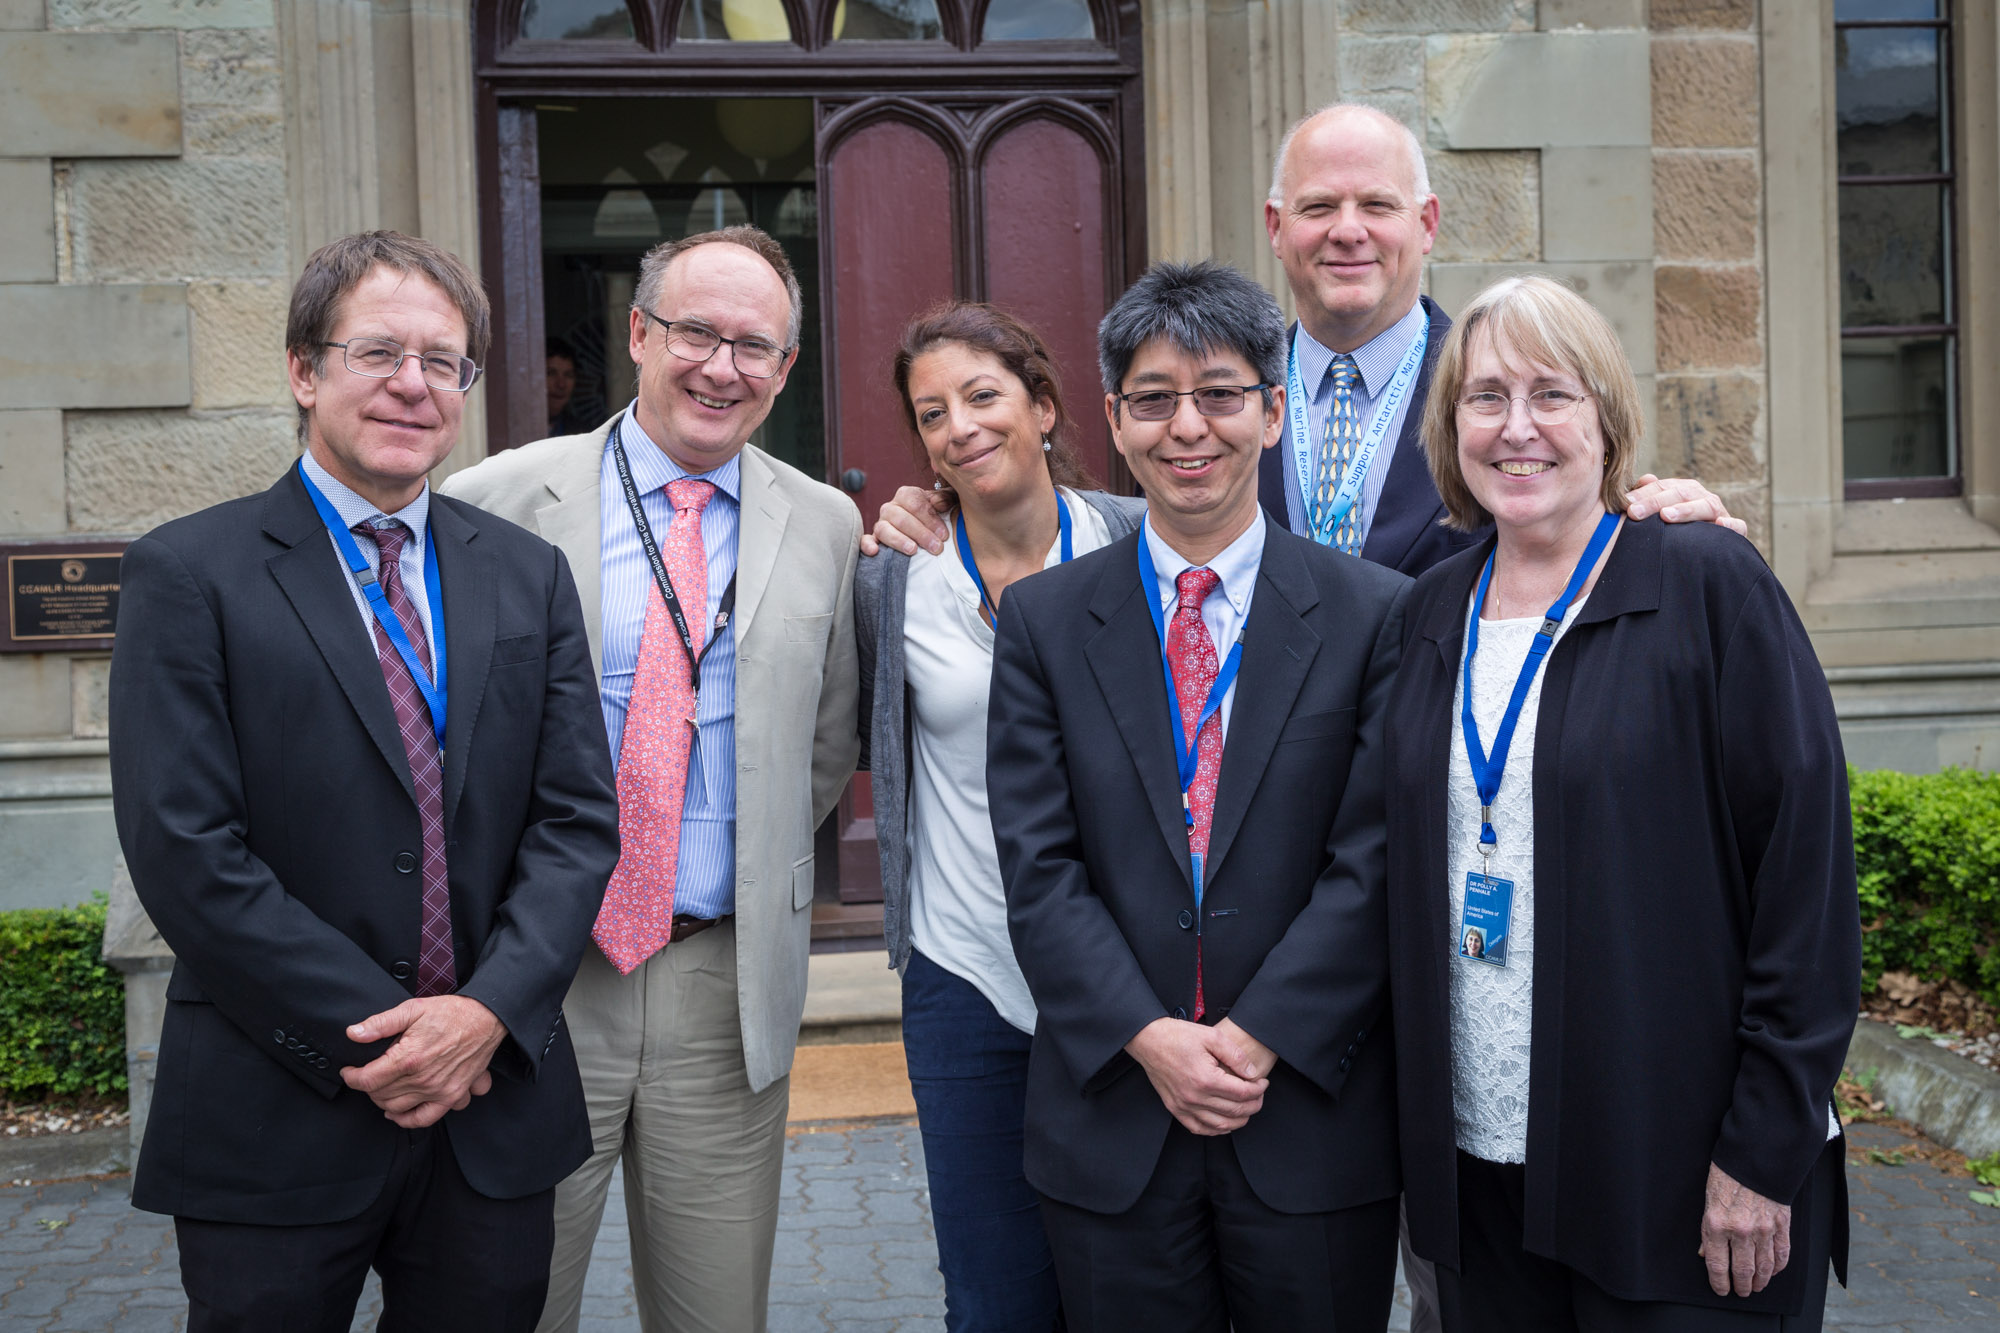 Photo: Members of AWR's Science Advisory Group;  Dr. Christopher Jones, Dr. Phil Trathan, Dr. Mercedez Santos, Dr. So Kawaguchi, d Dr. Rodolfo Werner (AWR Scientific Advisor and Board member), Dr. Polly Penhale